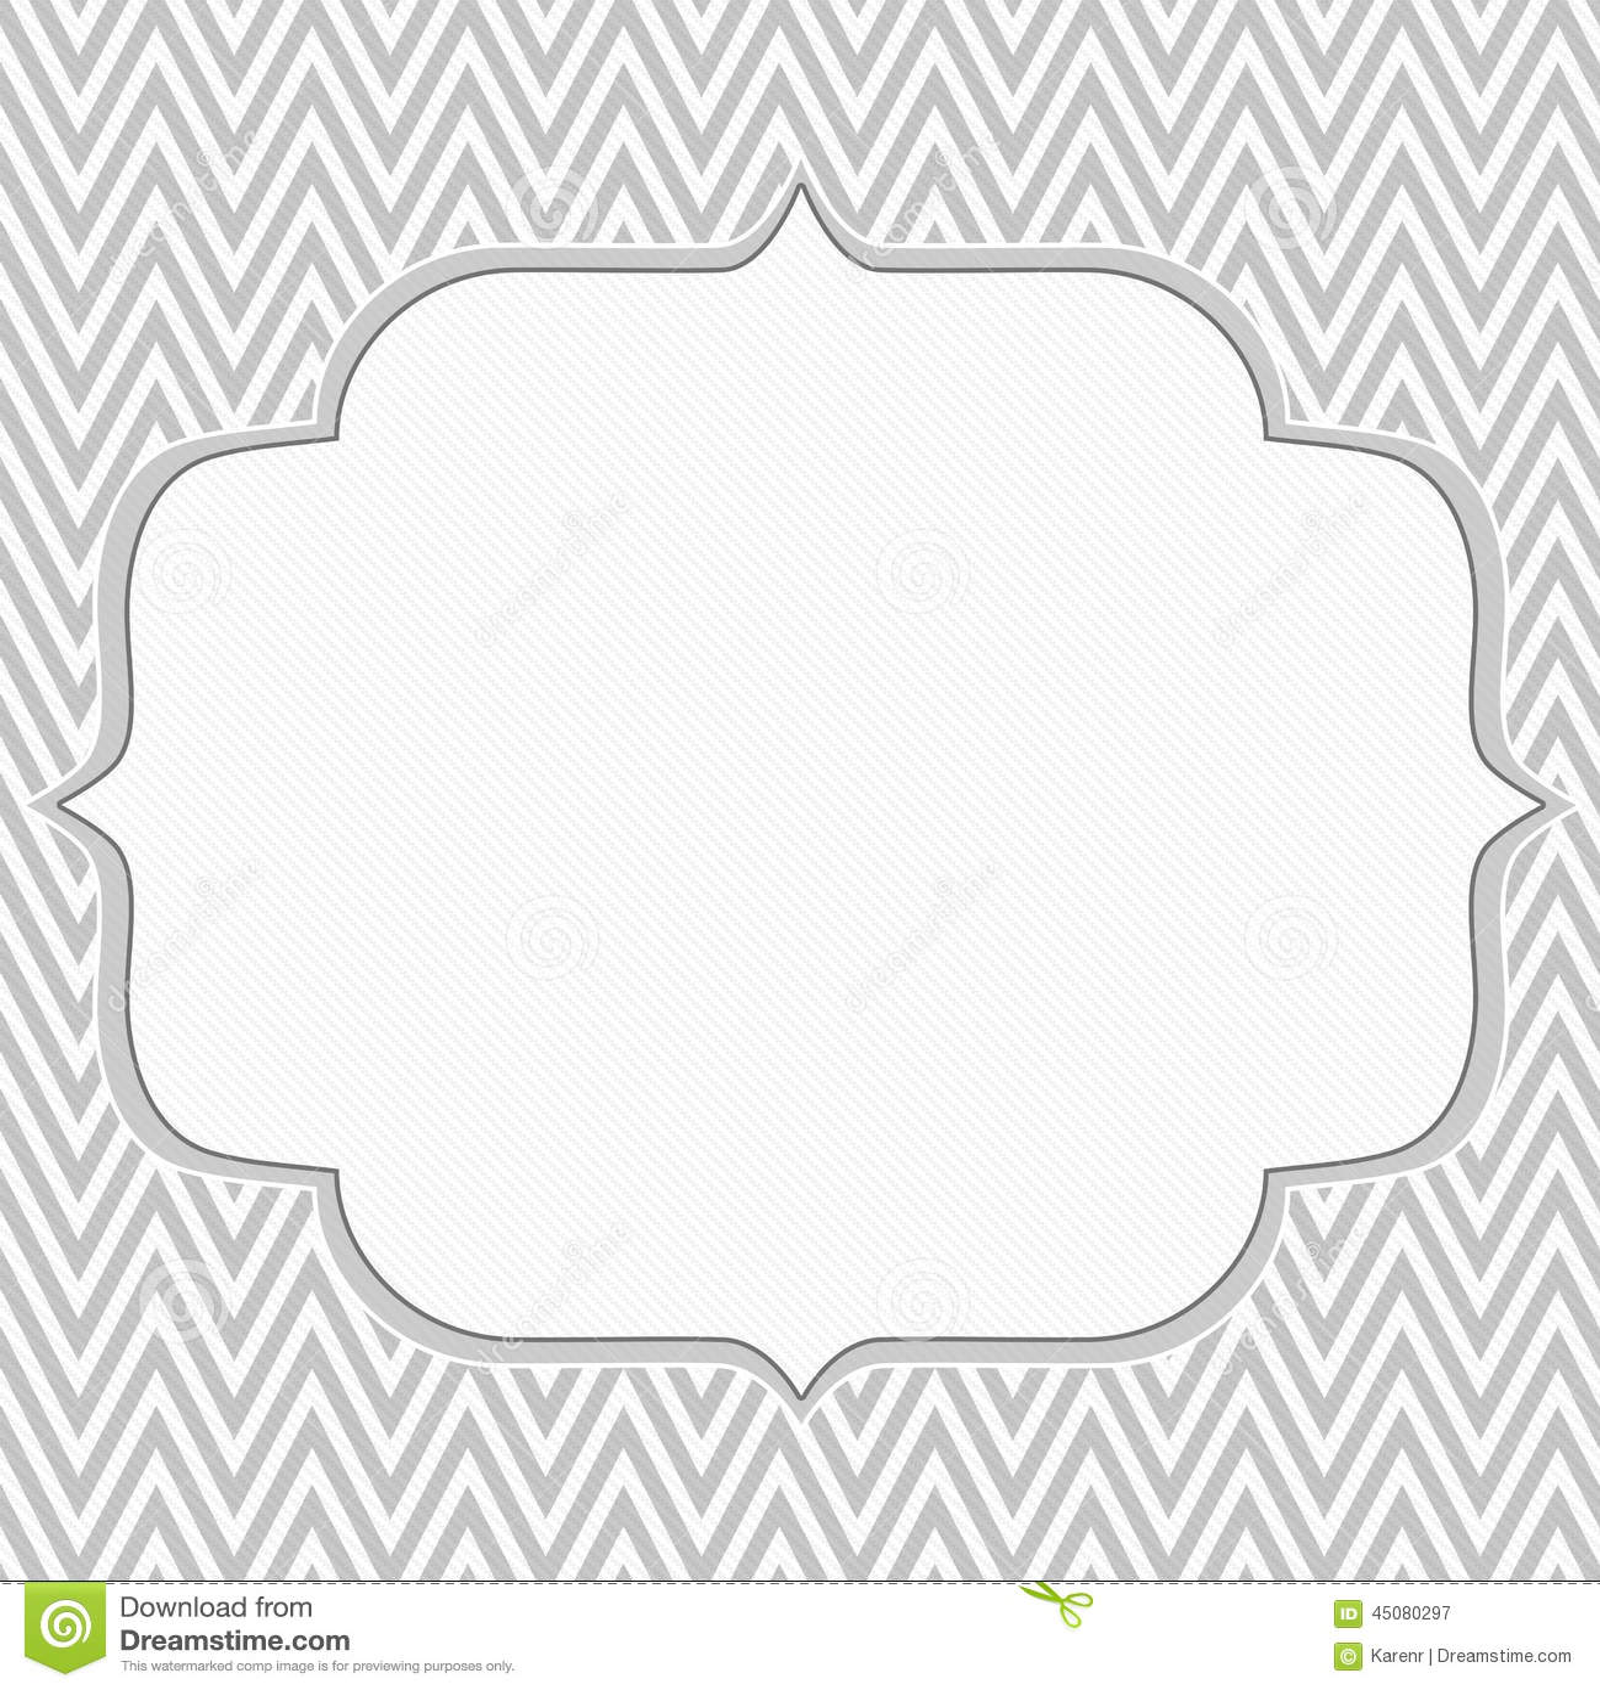 Gray And White Chevron Zigzag Frame Background Stock